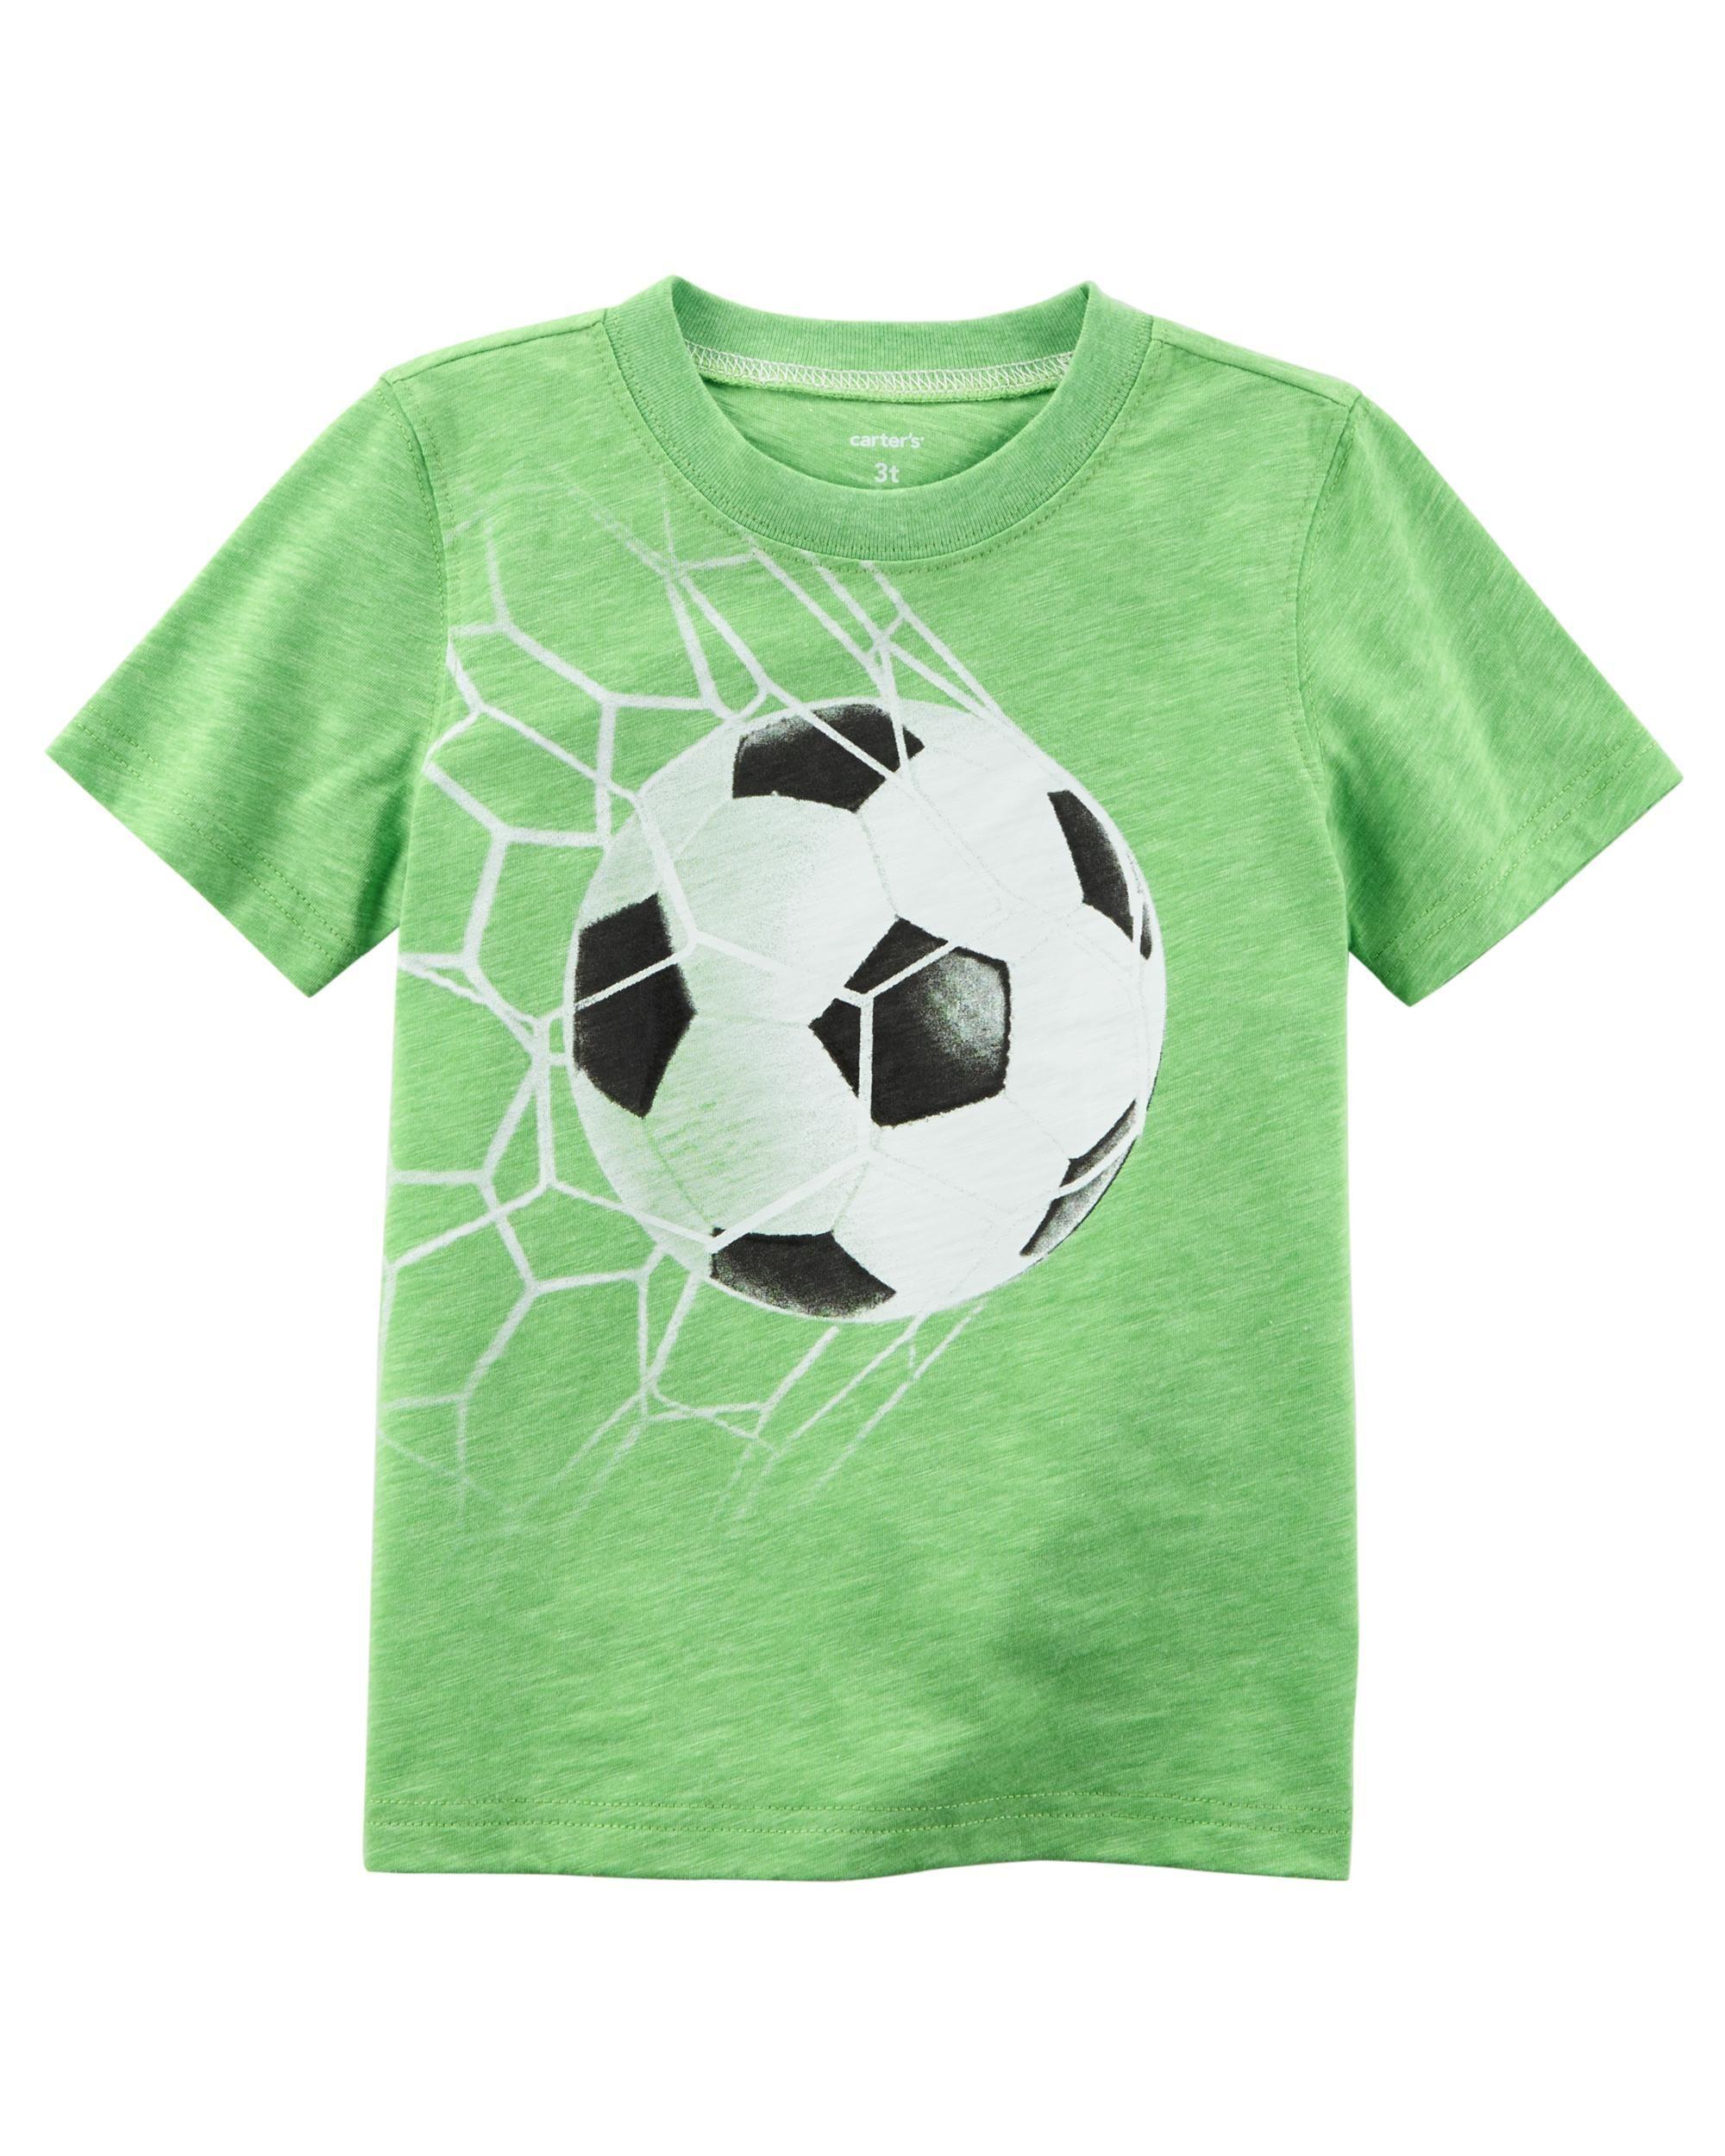 a0466b18db6 Baby Boy Neon Soccer Jersey Tee